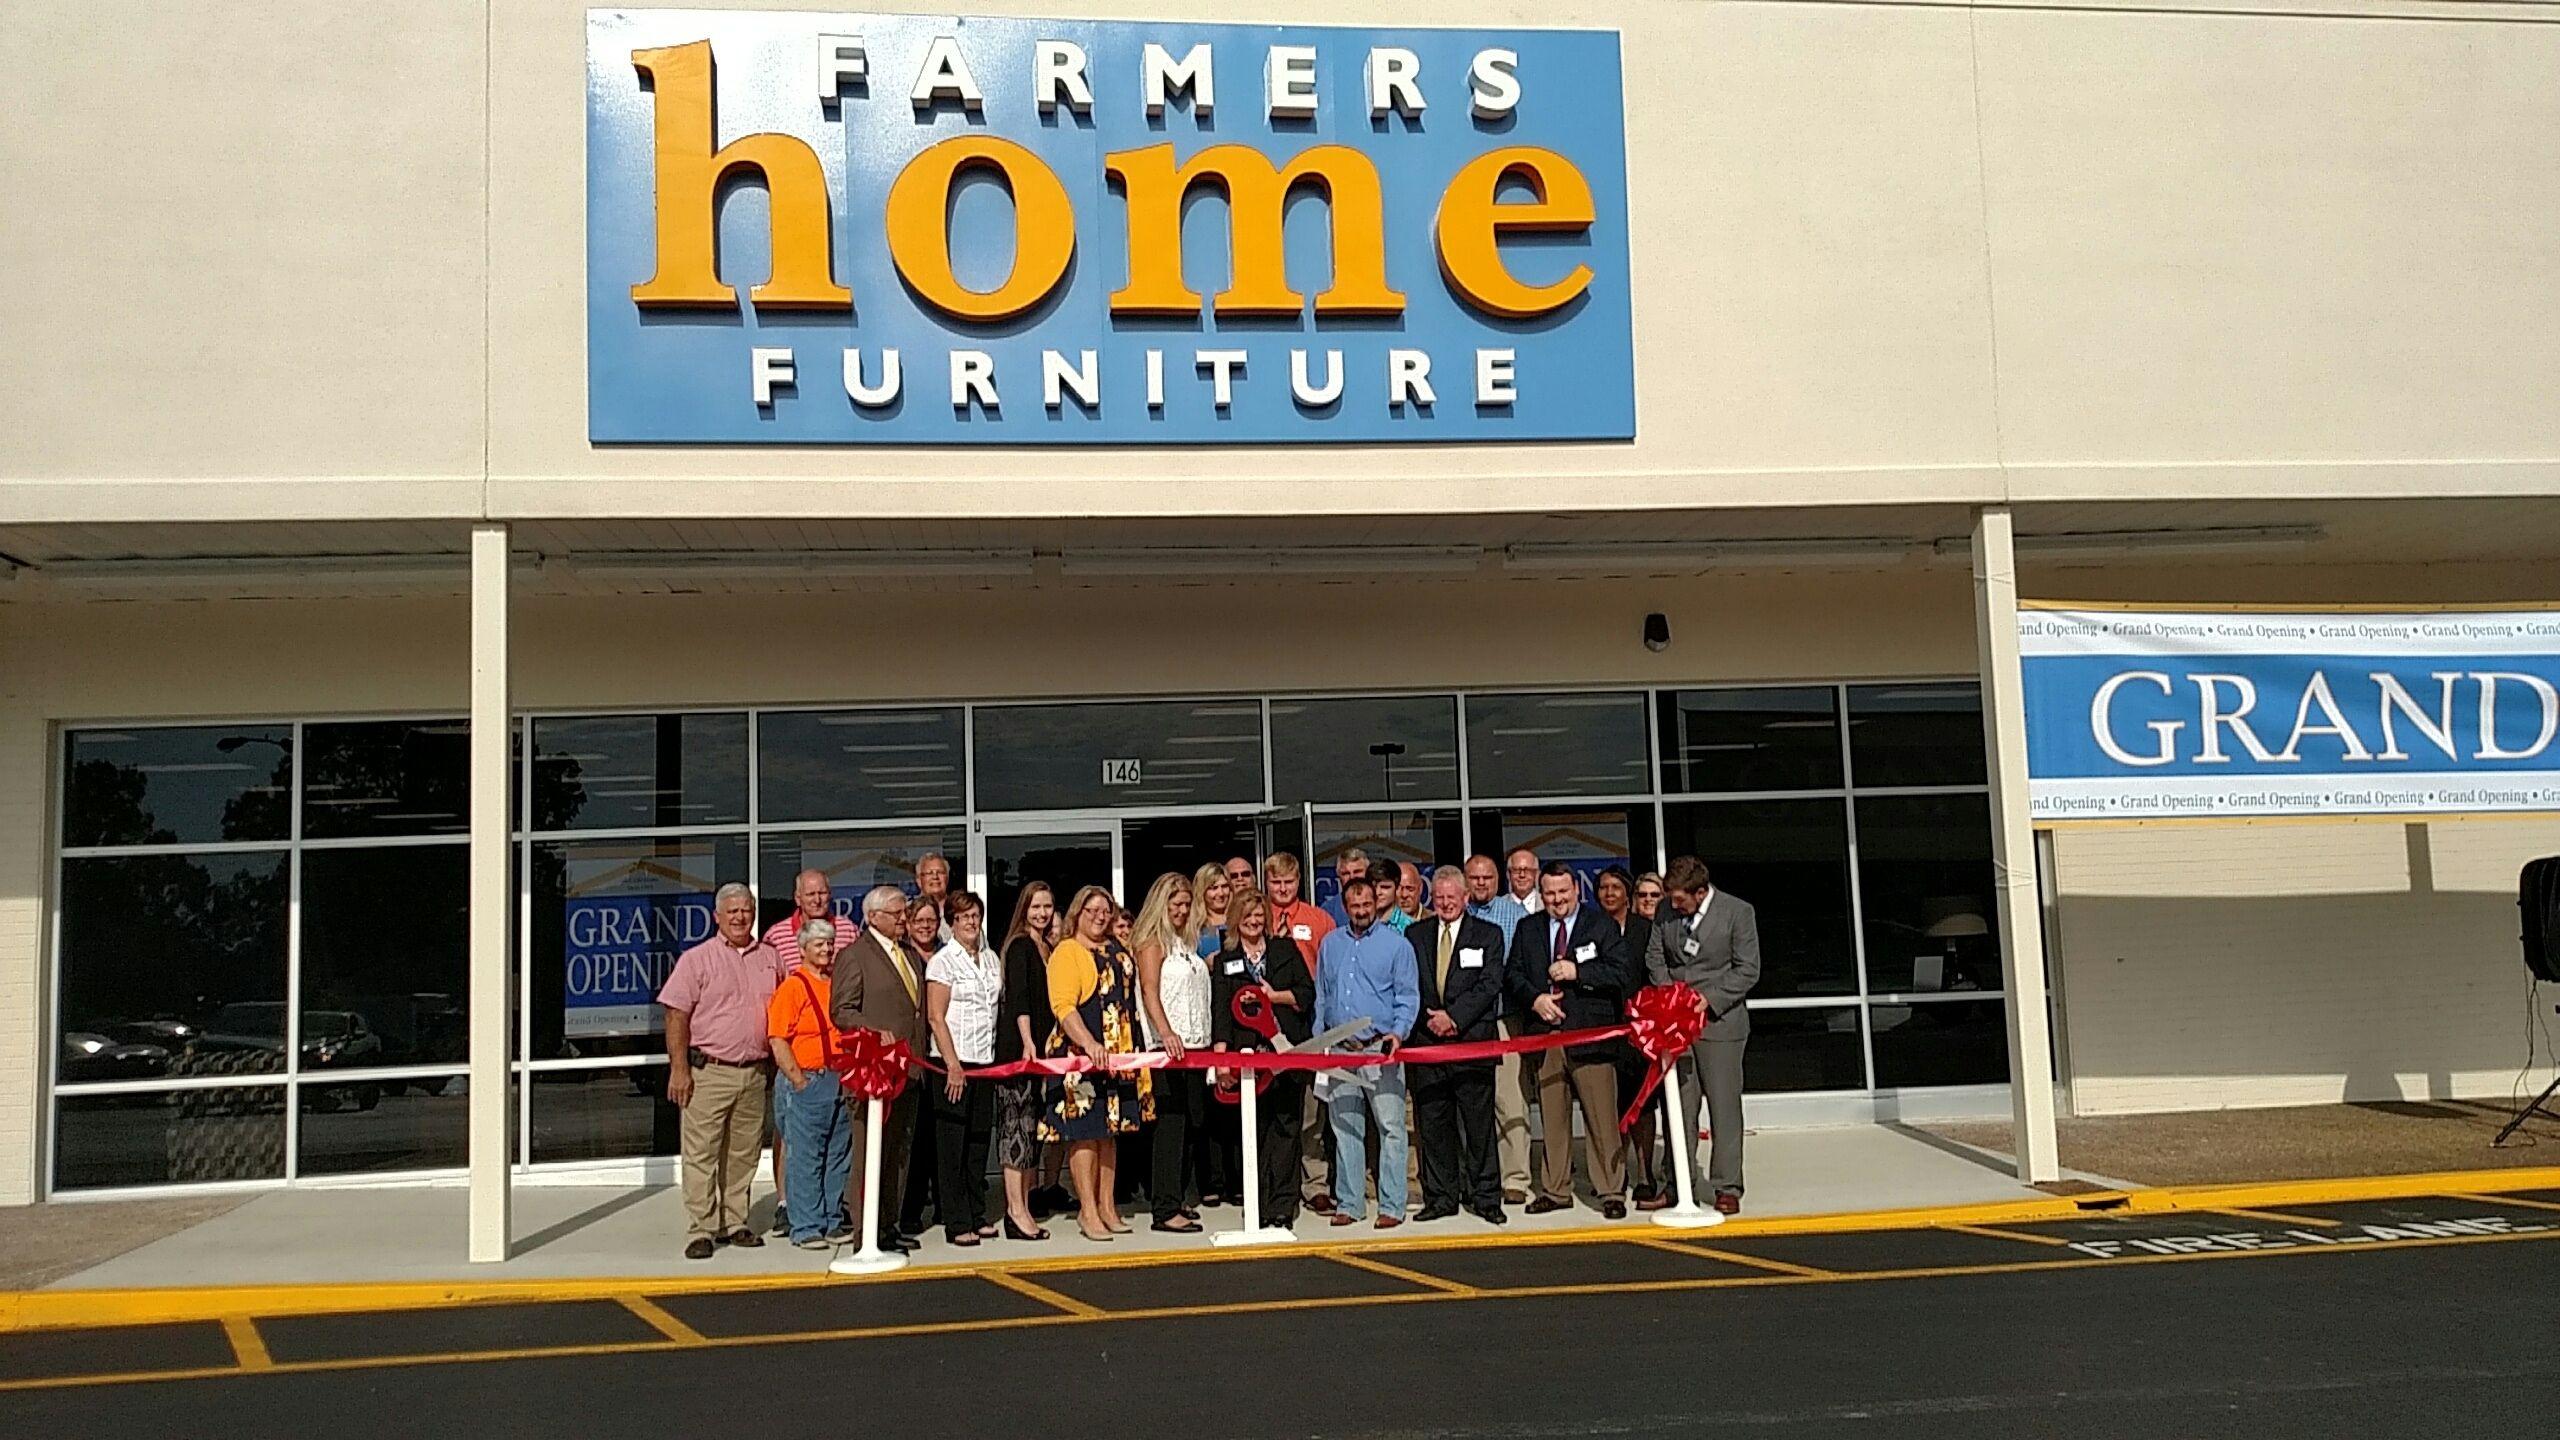 Grand opening of Farmers Home Furniture in lewisburgtn